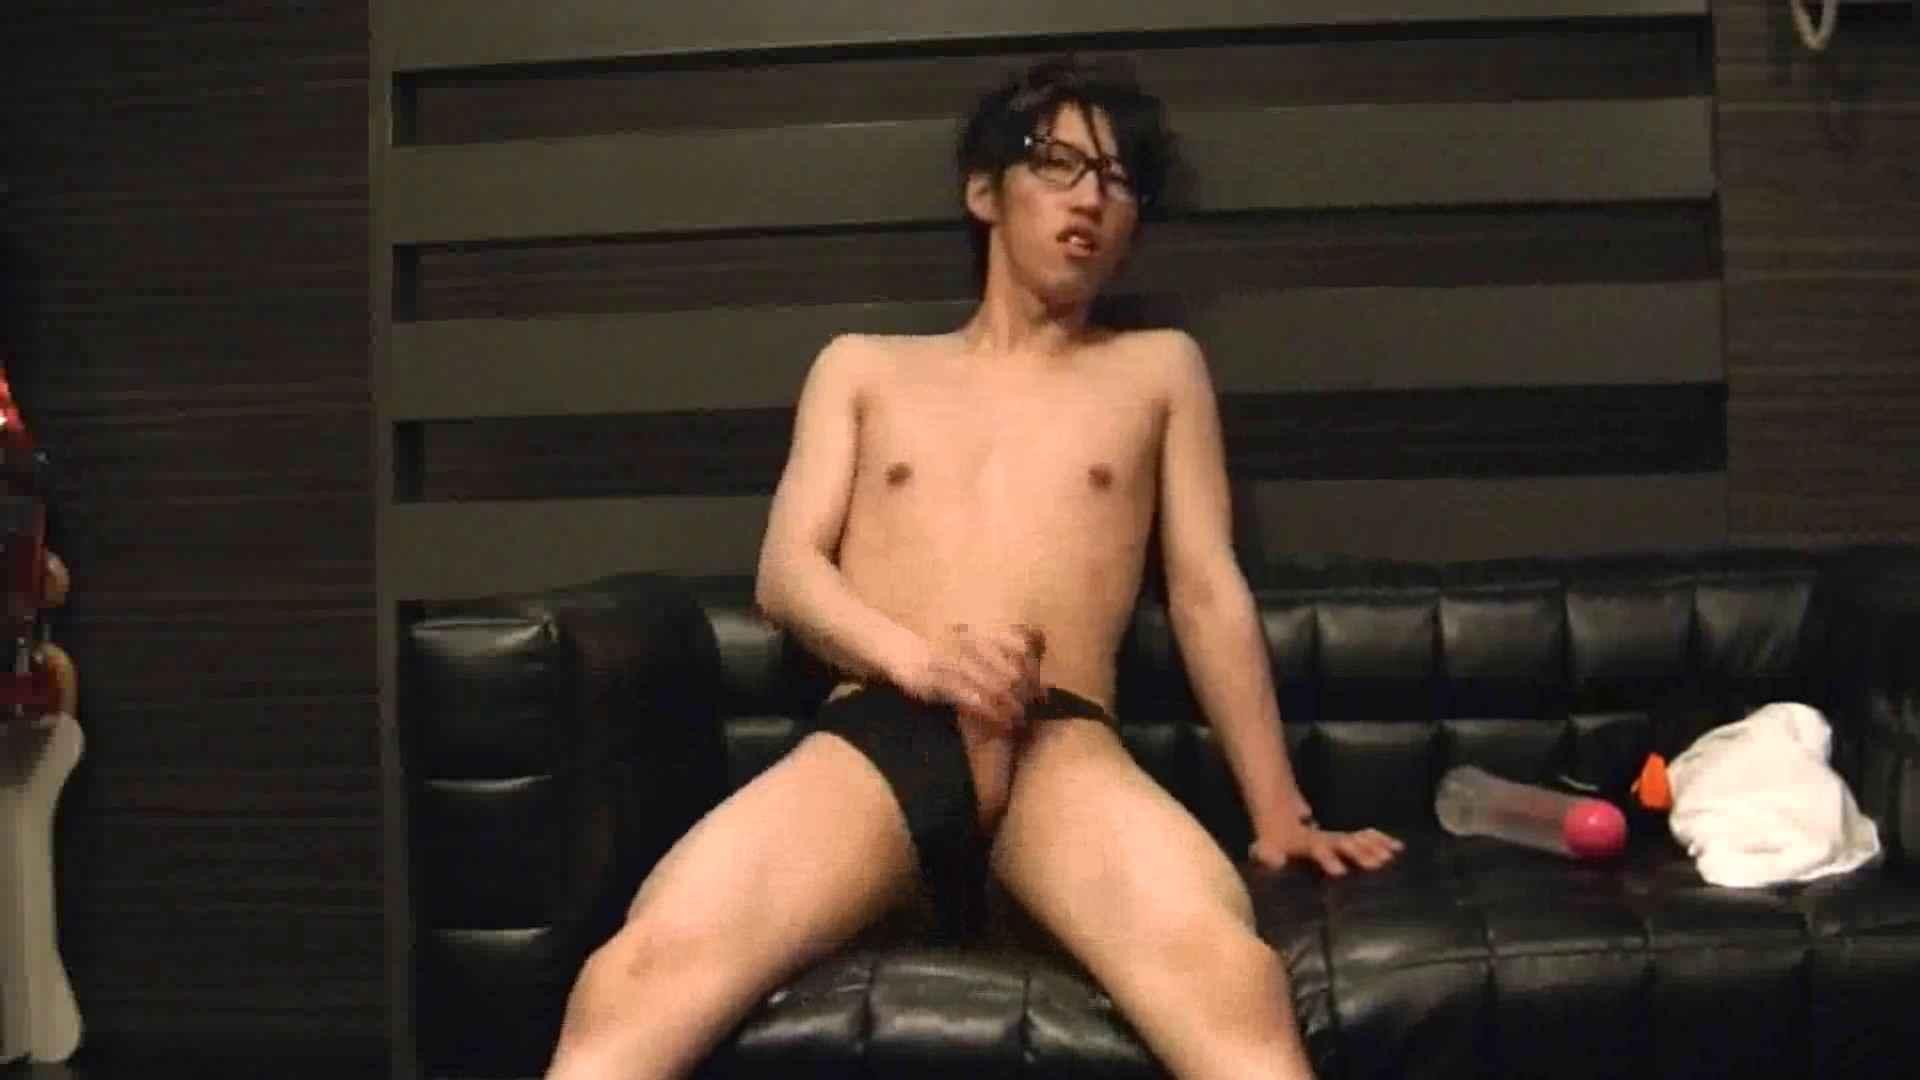 ONA見せカーニバル!! Vol3 男 ゲイ無料無修正画像 89枚 71